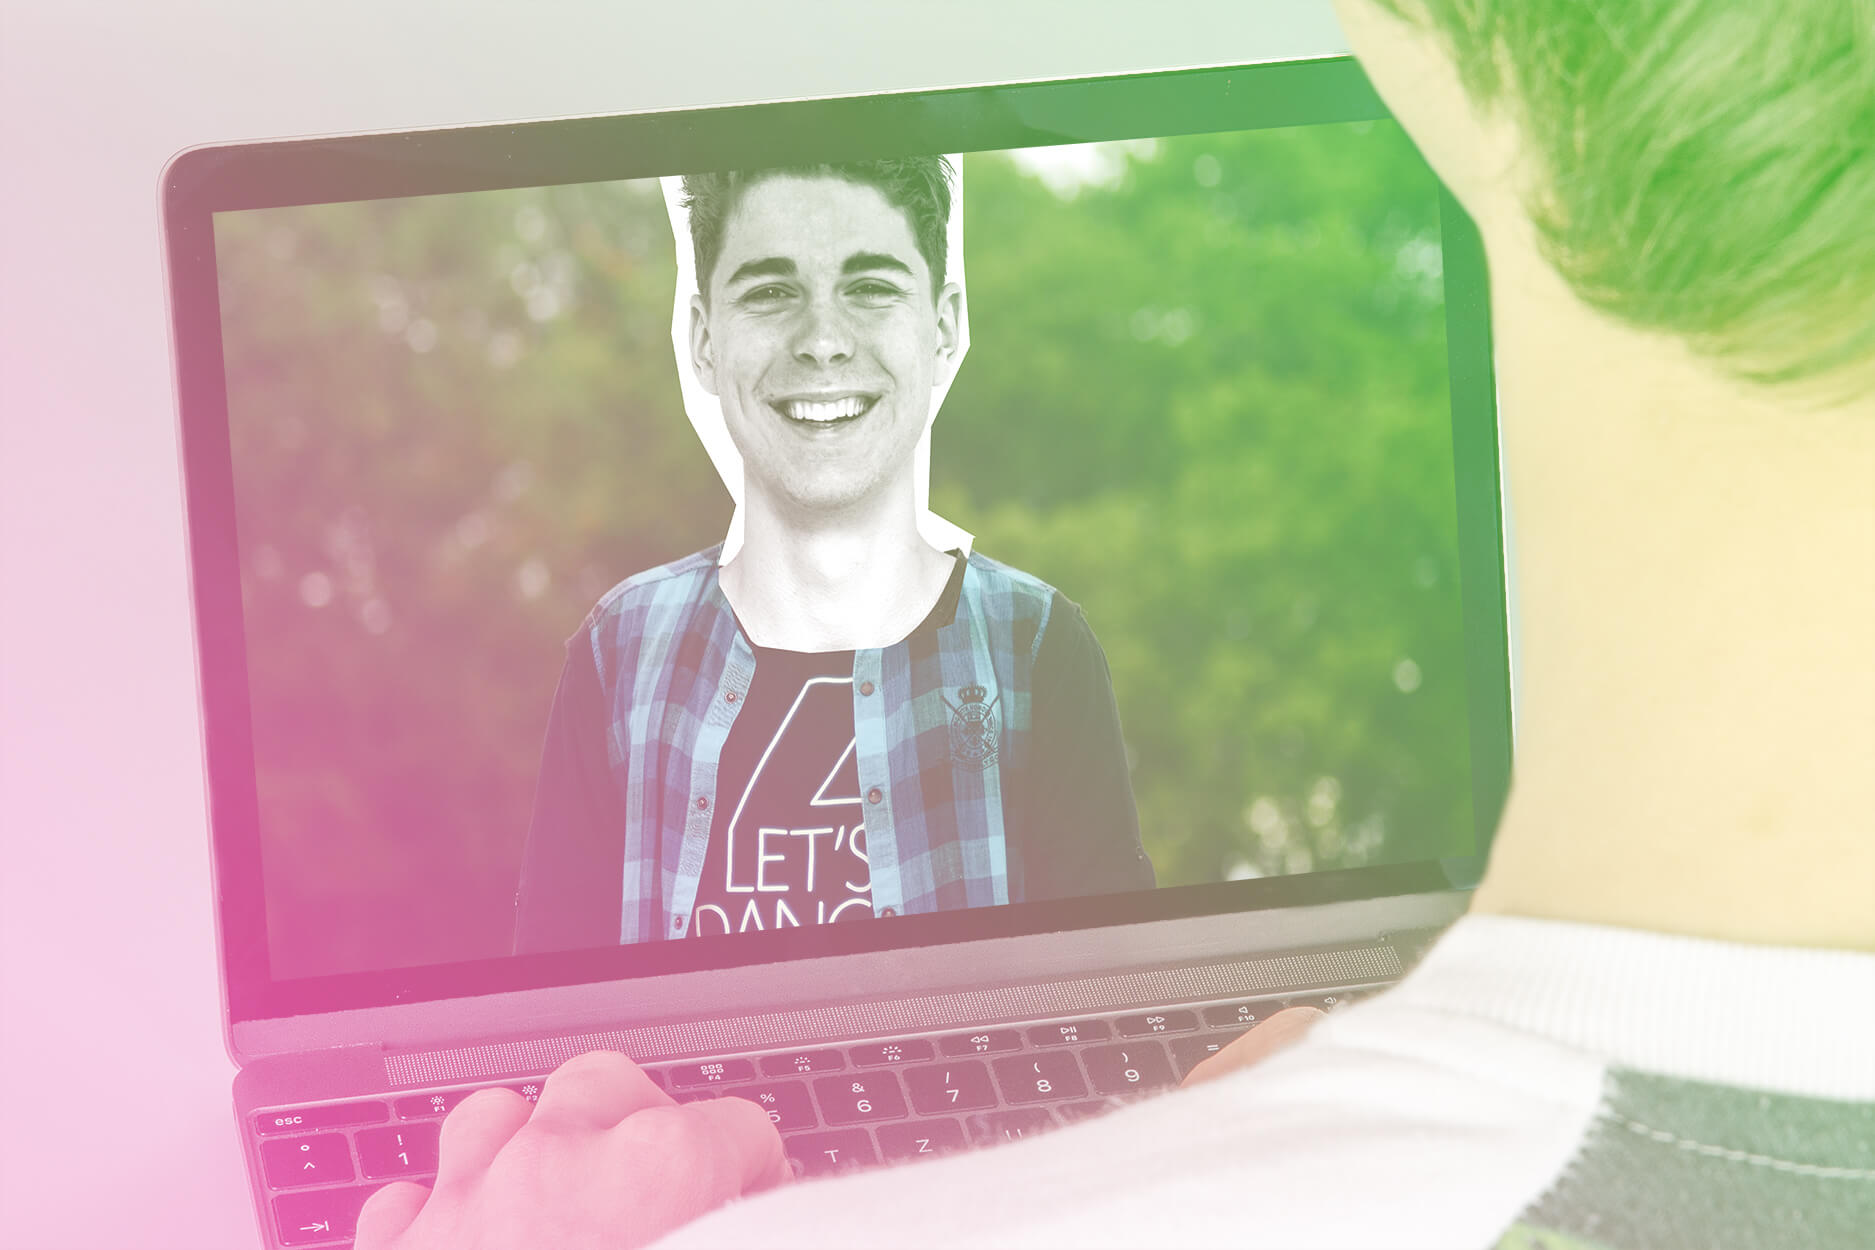 Online dating fake profile erkennen